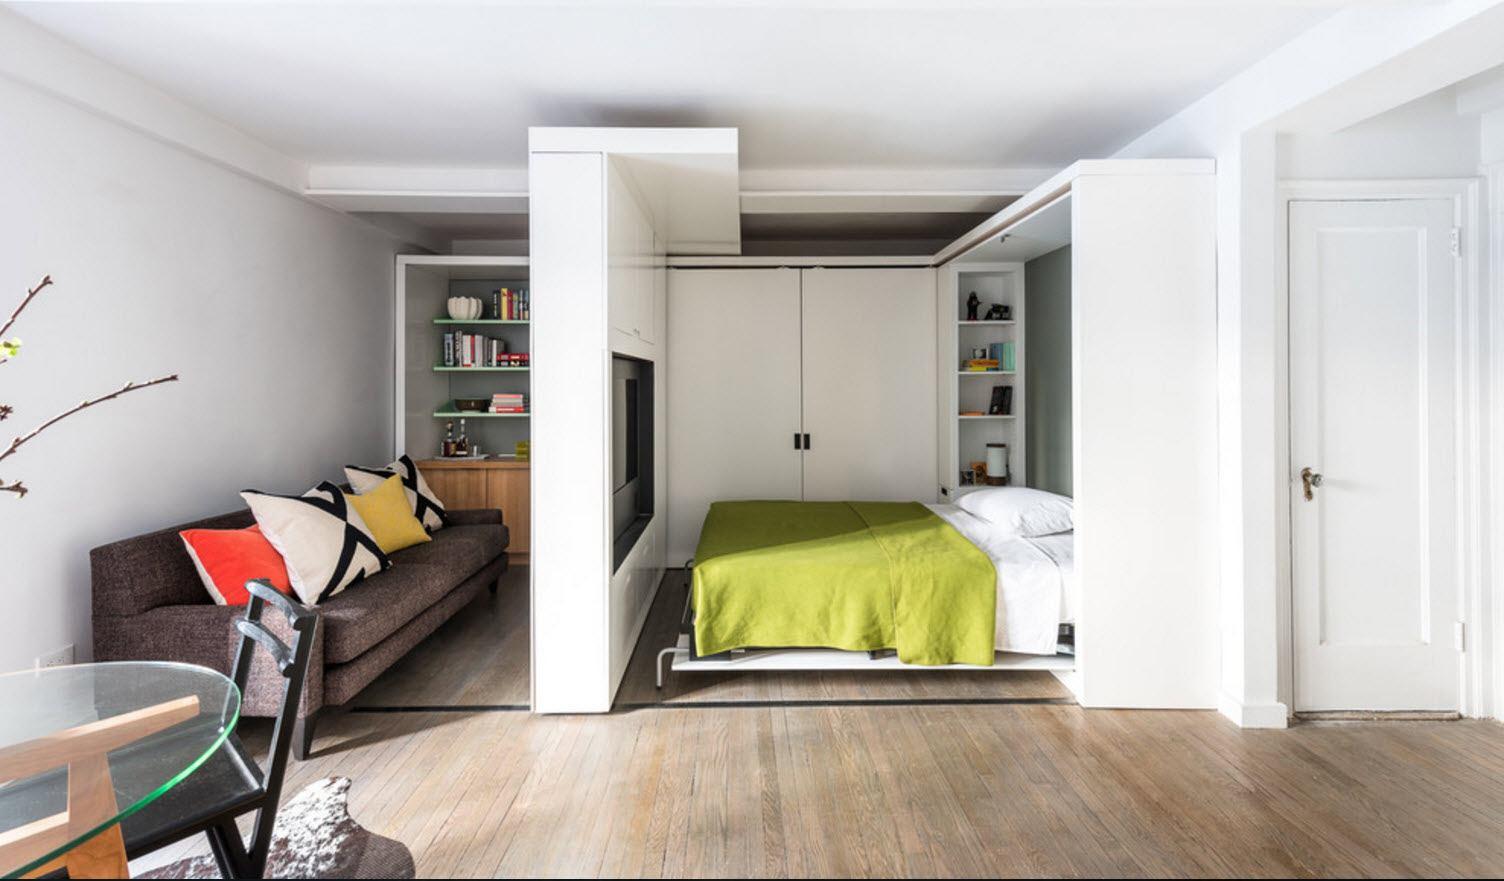 Интерьер однокомнатной квартиры как сделать две